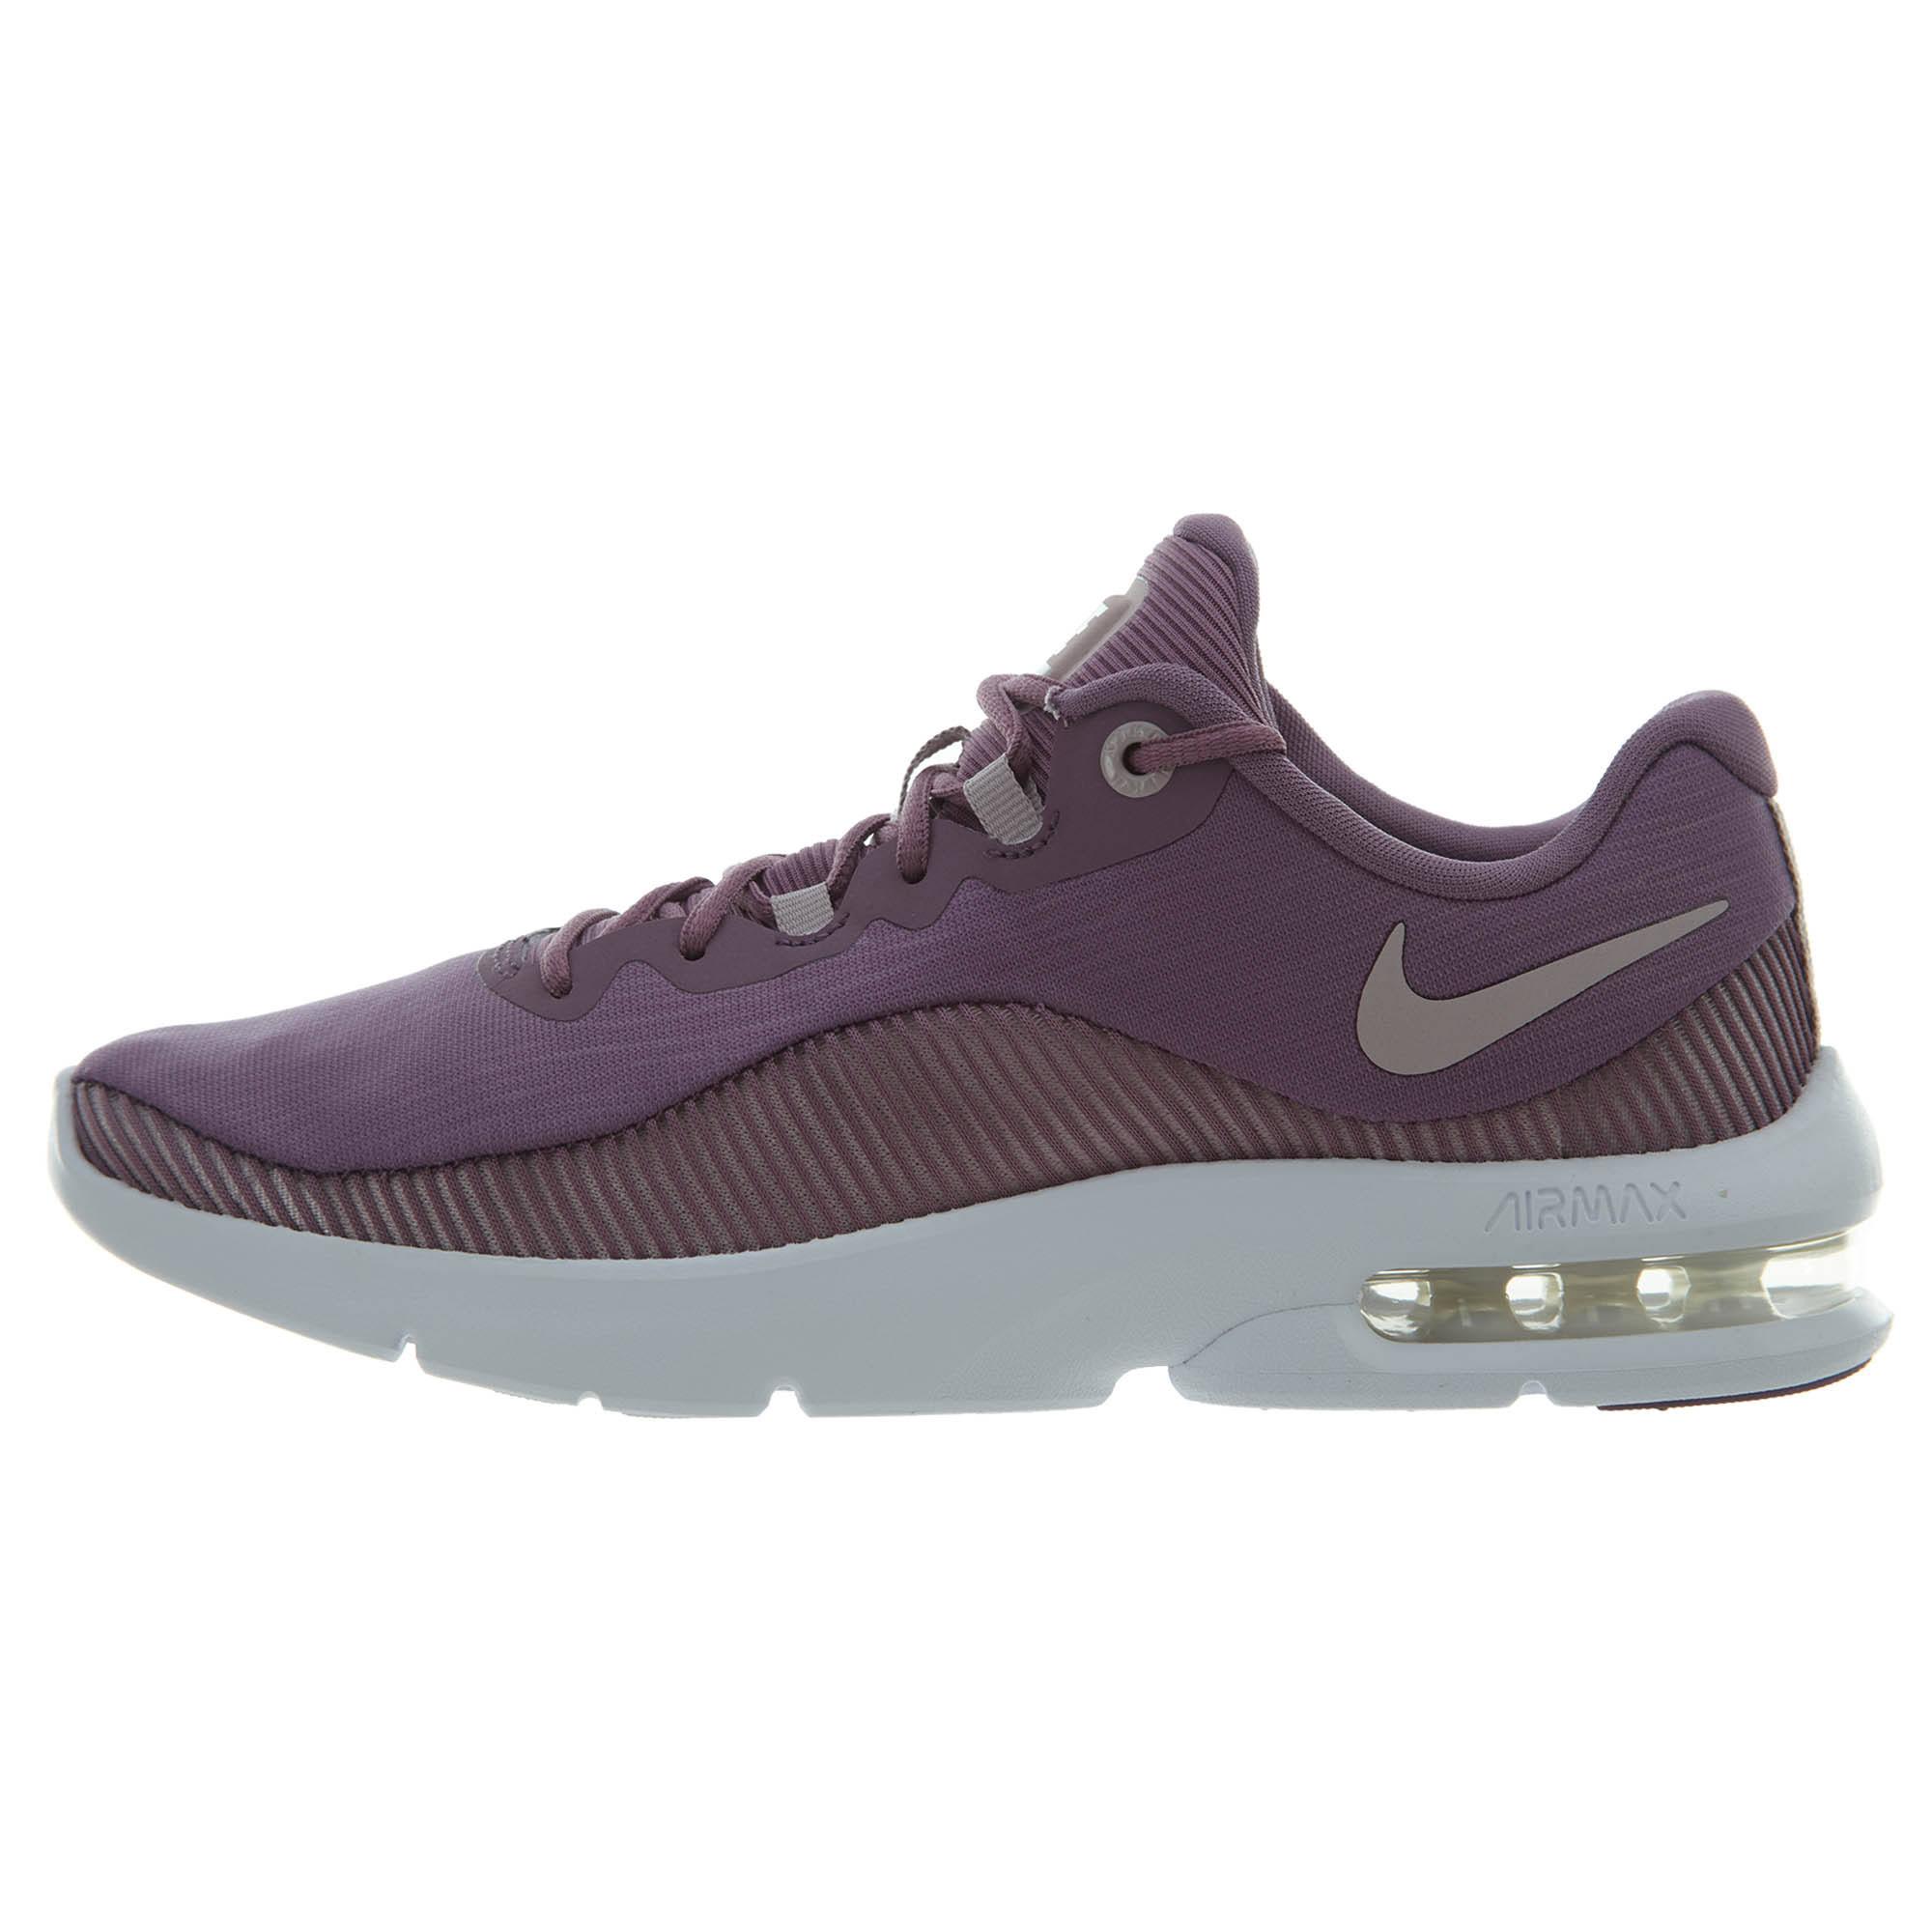 Staub Air 500 Partikel Aa7407 sneaker Advantage 2 Violett Max Rose Mesh Nike UqvwdzdT